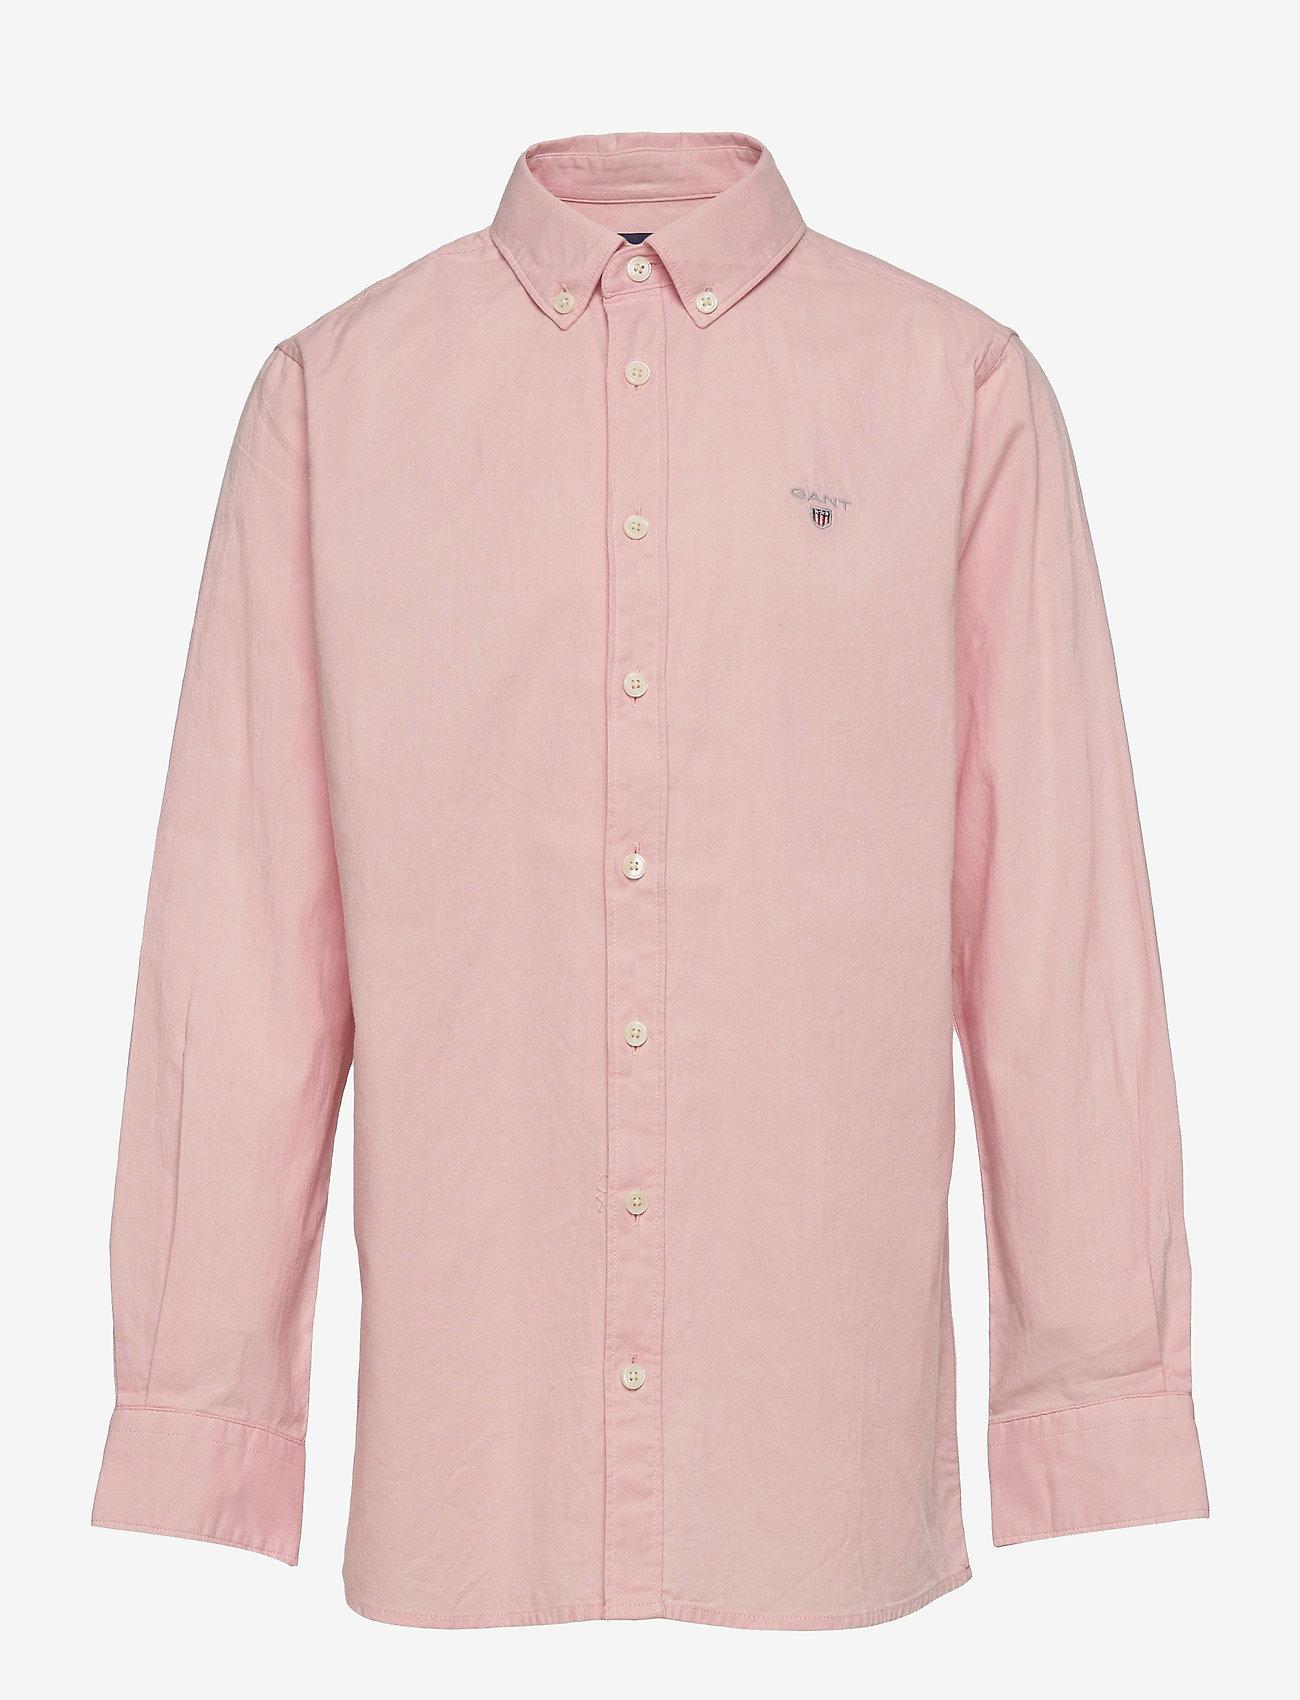 GANT - ARCHIVE OXFORD B.D SHIRT - shirts - quartz pink - 0